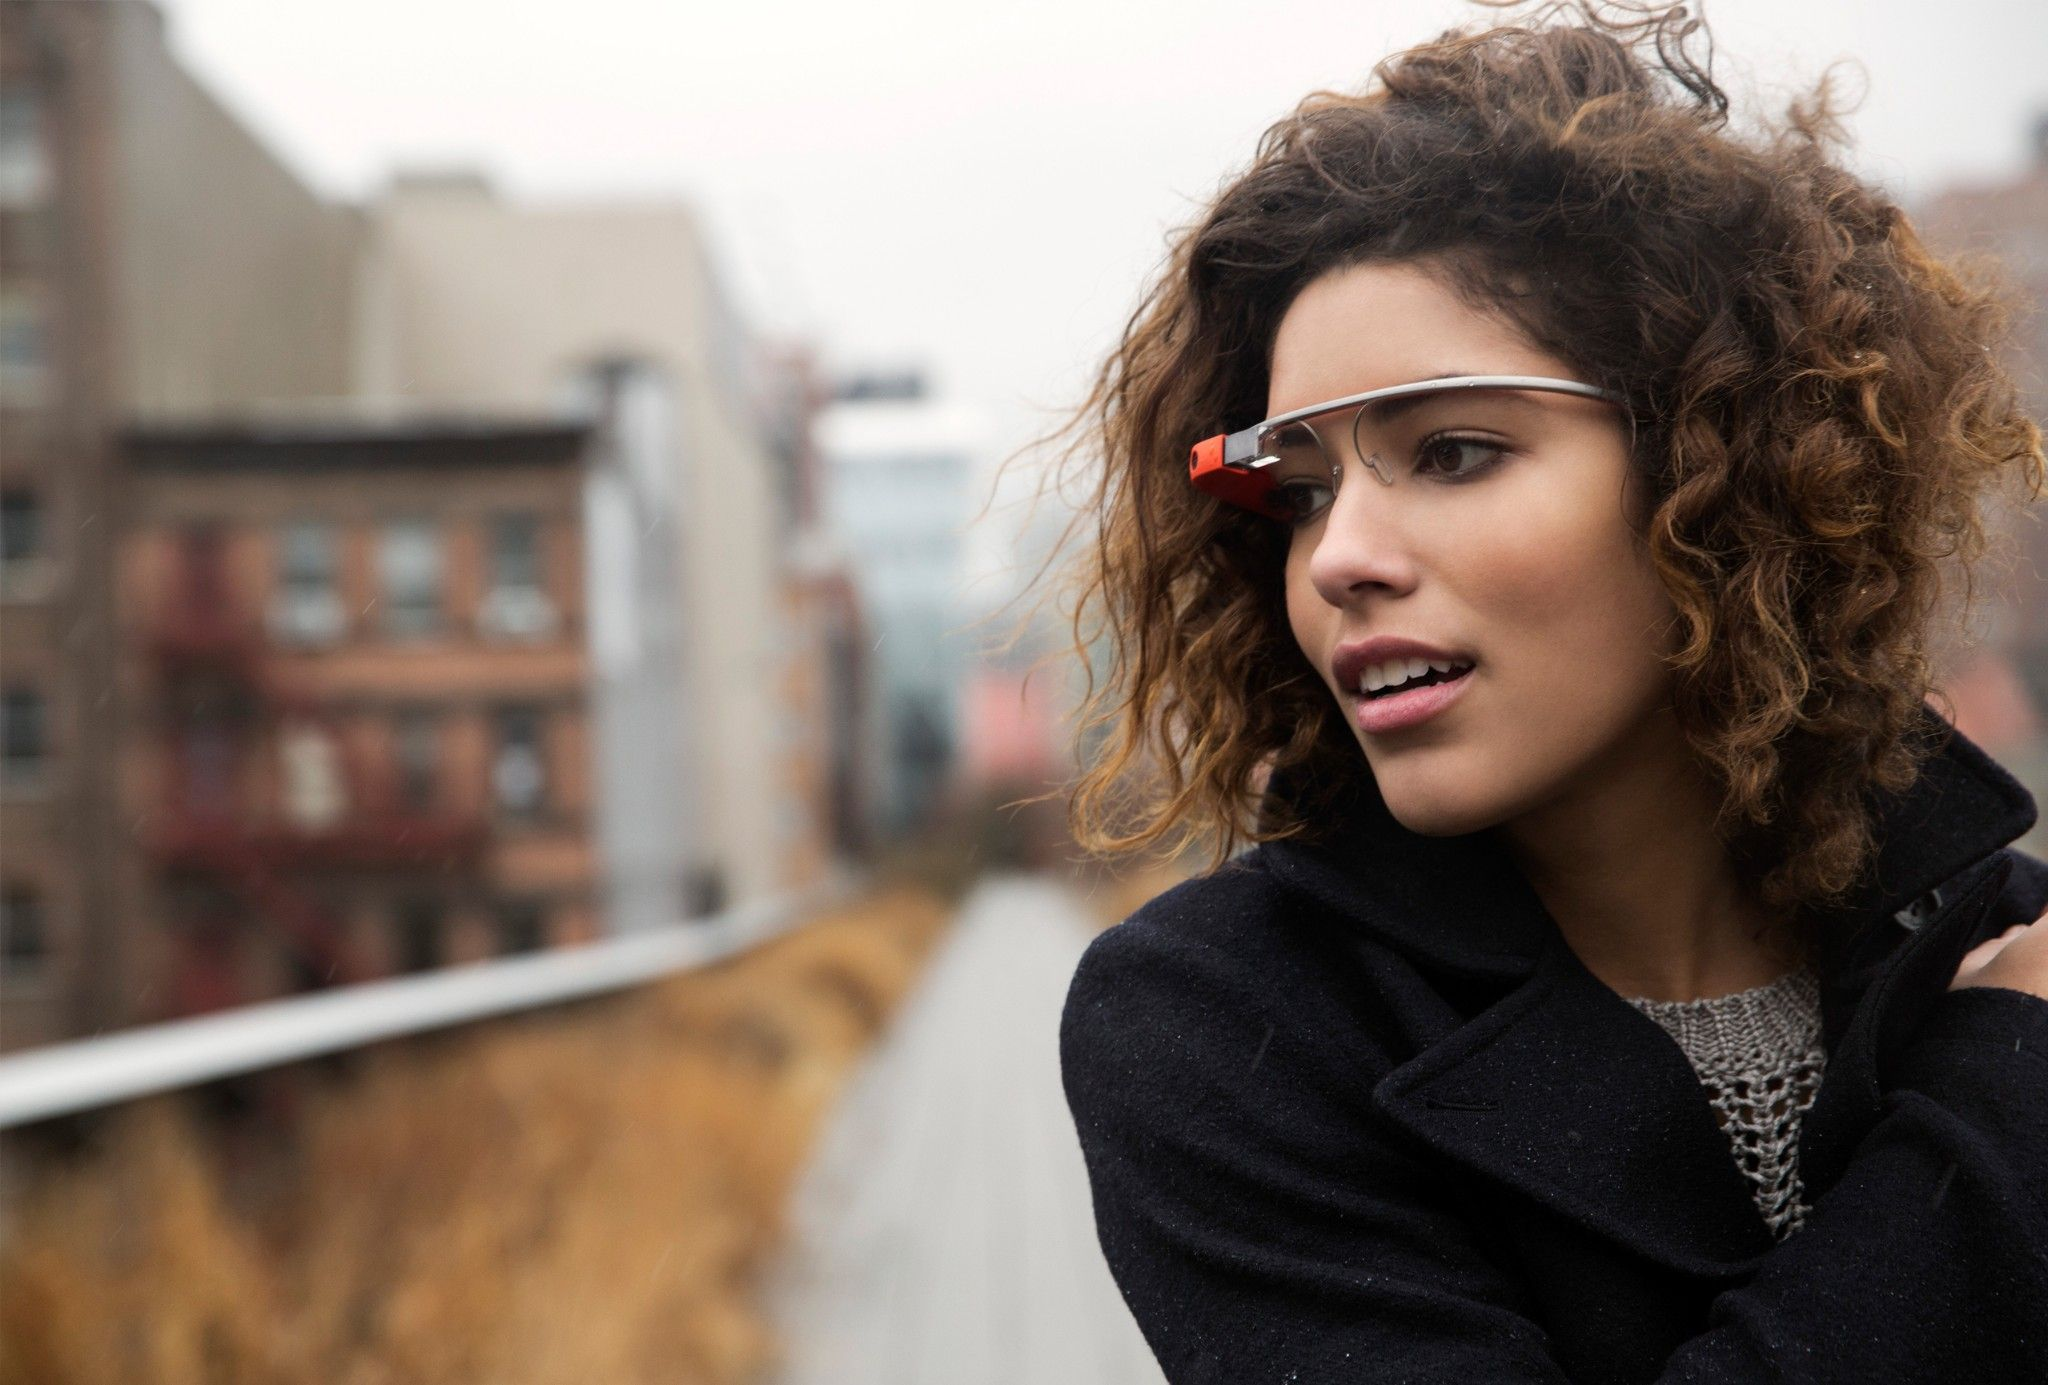 Twitter drops Google Glass app